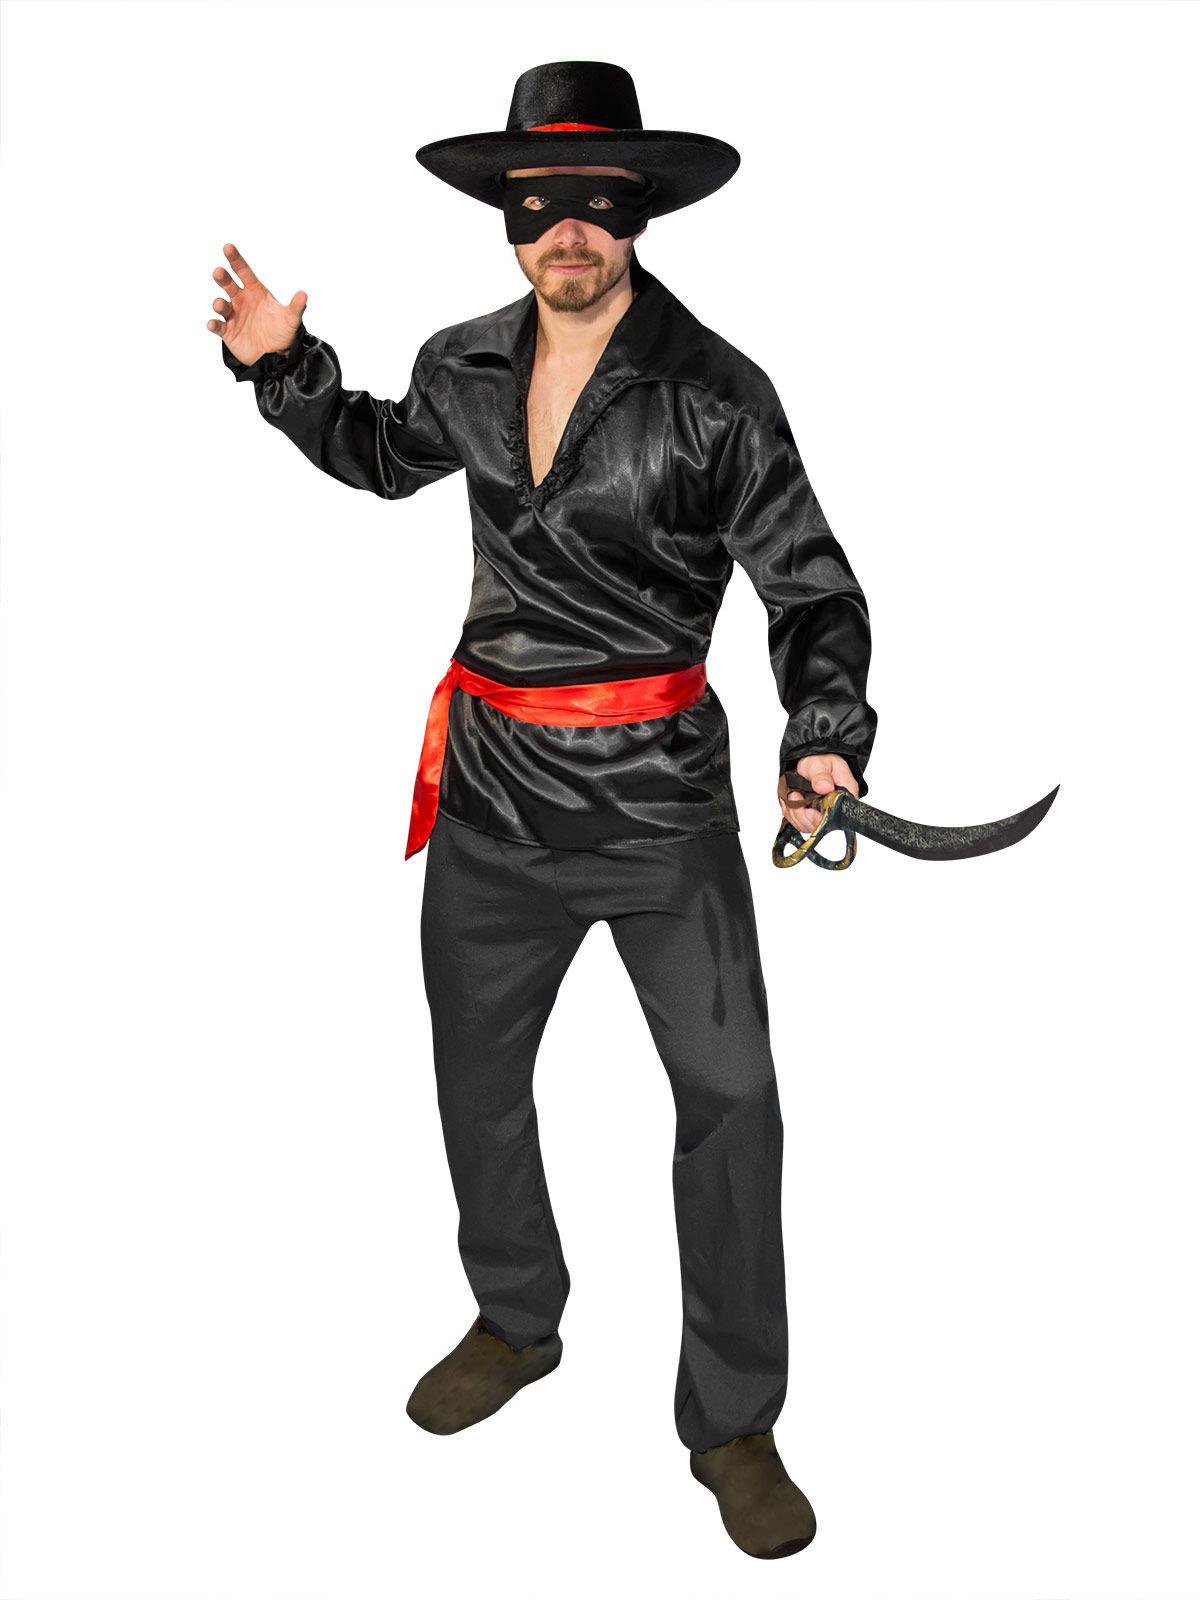 Bandit Rauber Kostum Schwarz Rot Weiss Gunstige Faschings Kostume